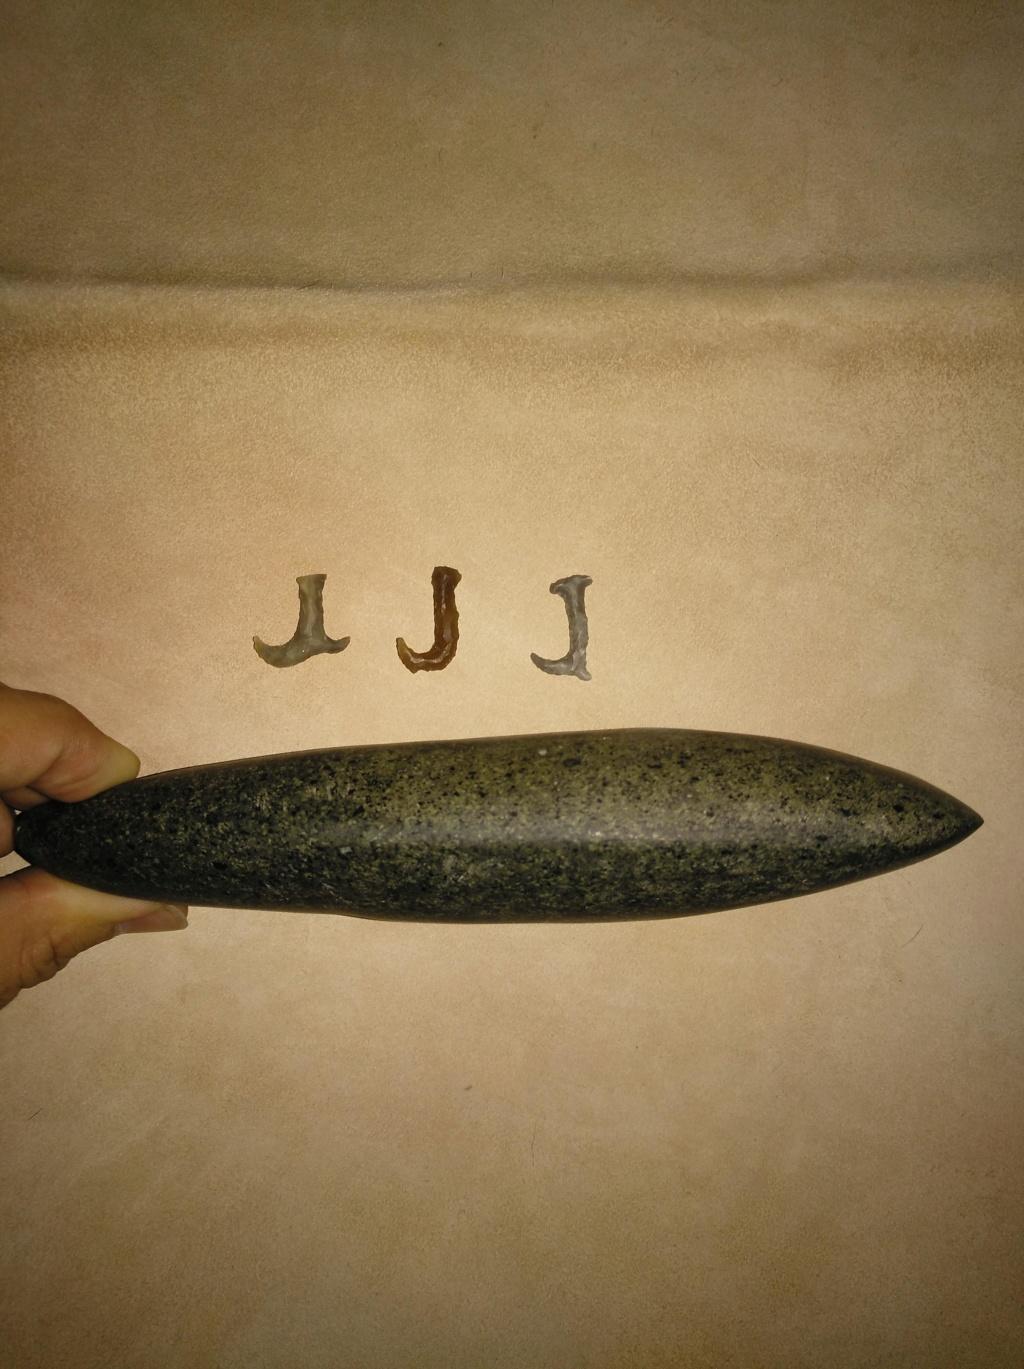 Paleotrueque de Joseju a Miguelon19 Img_2082